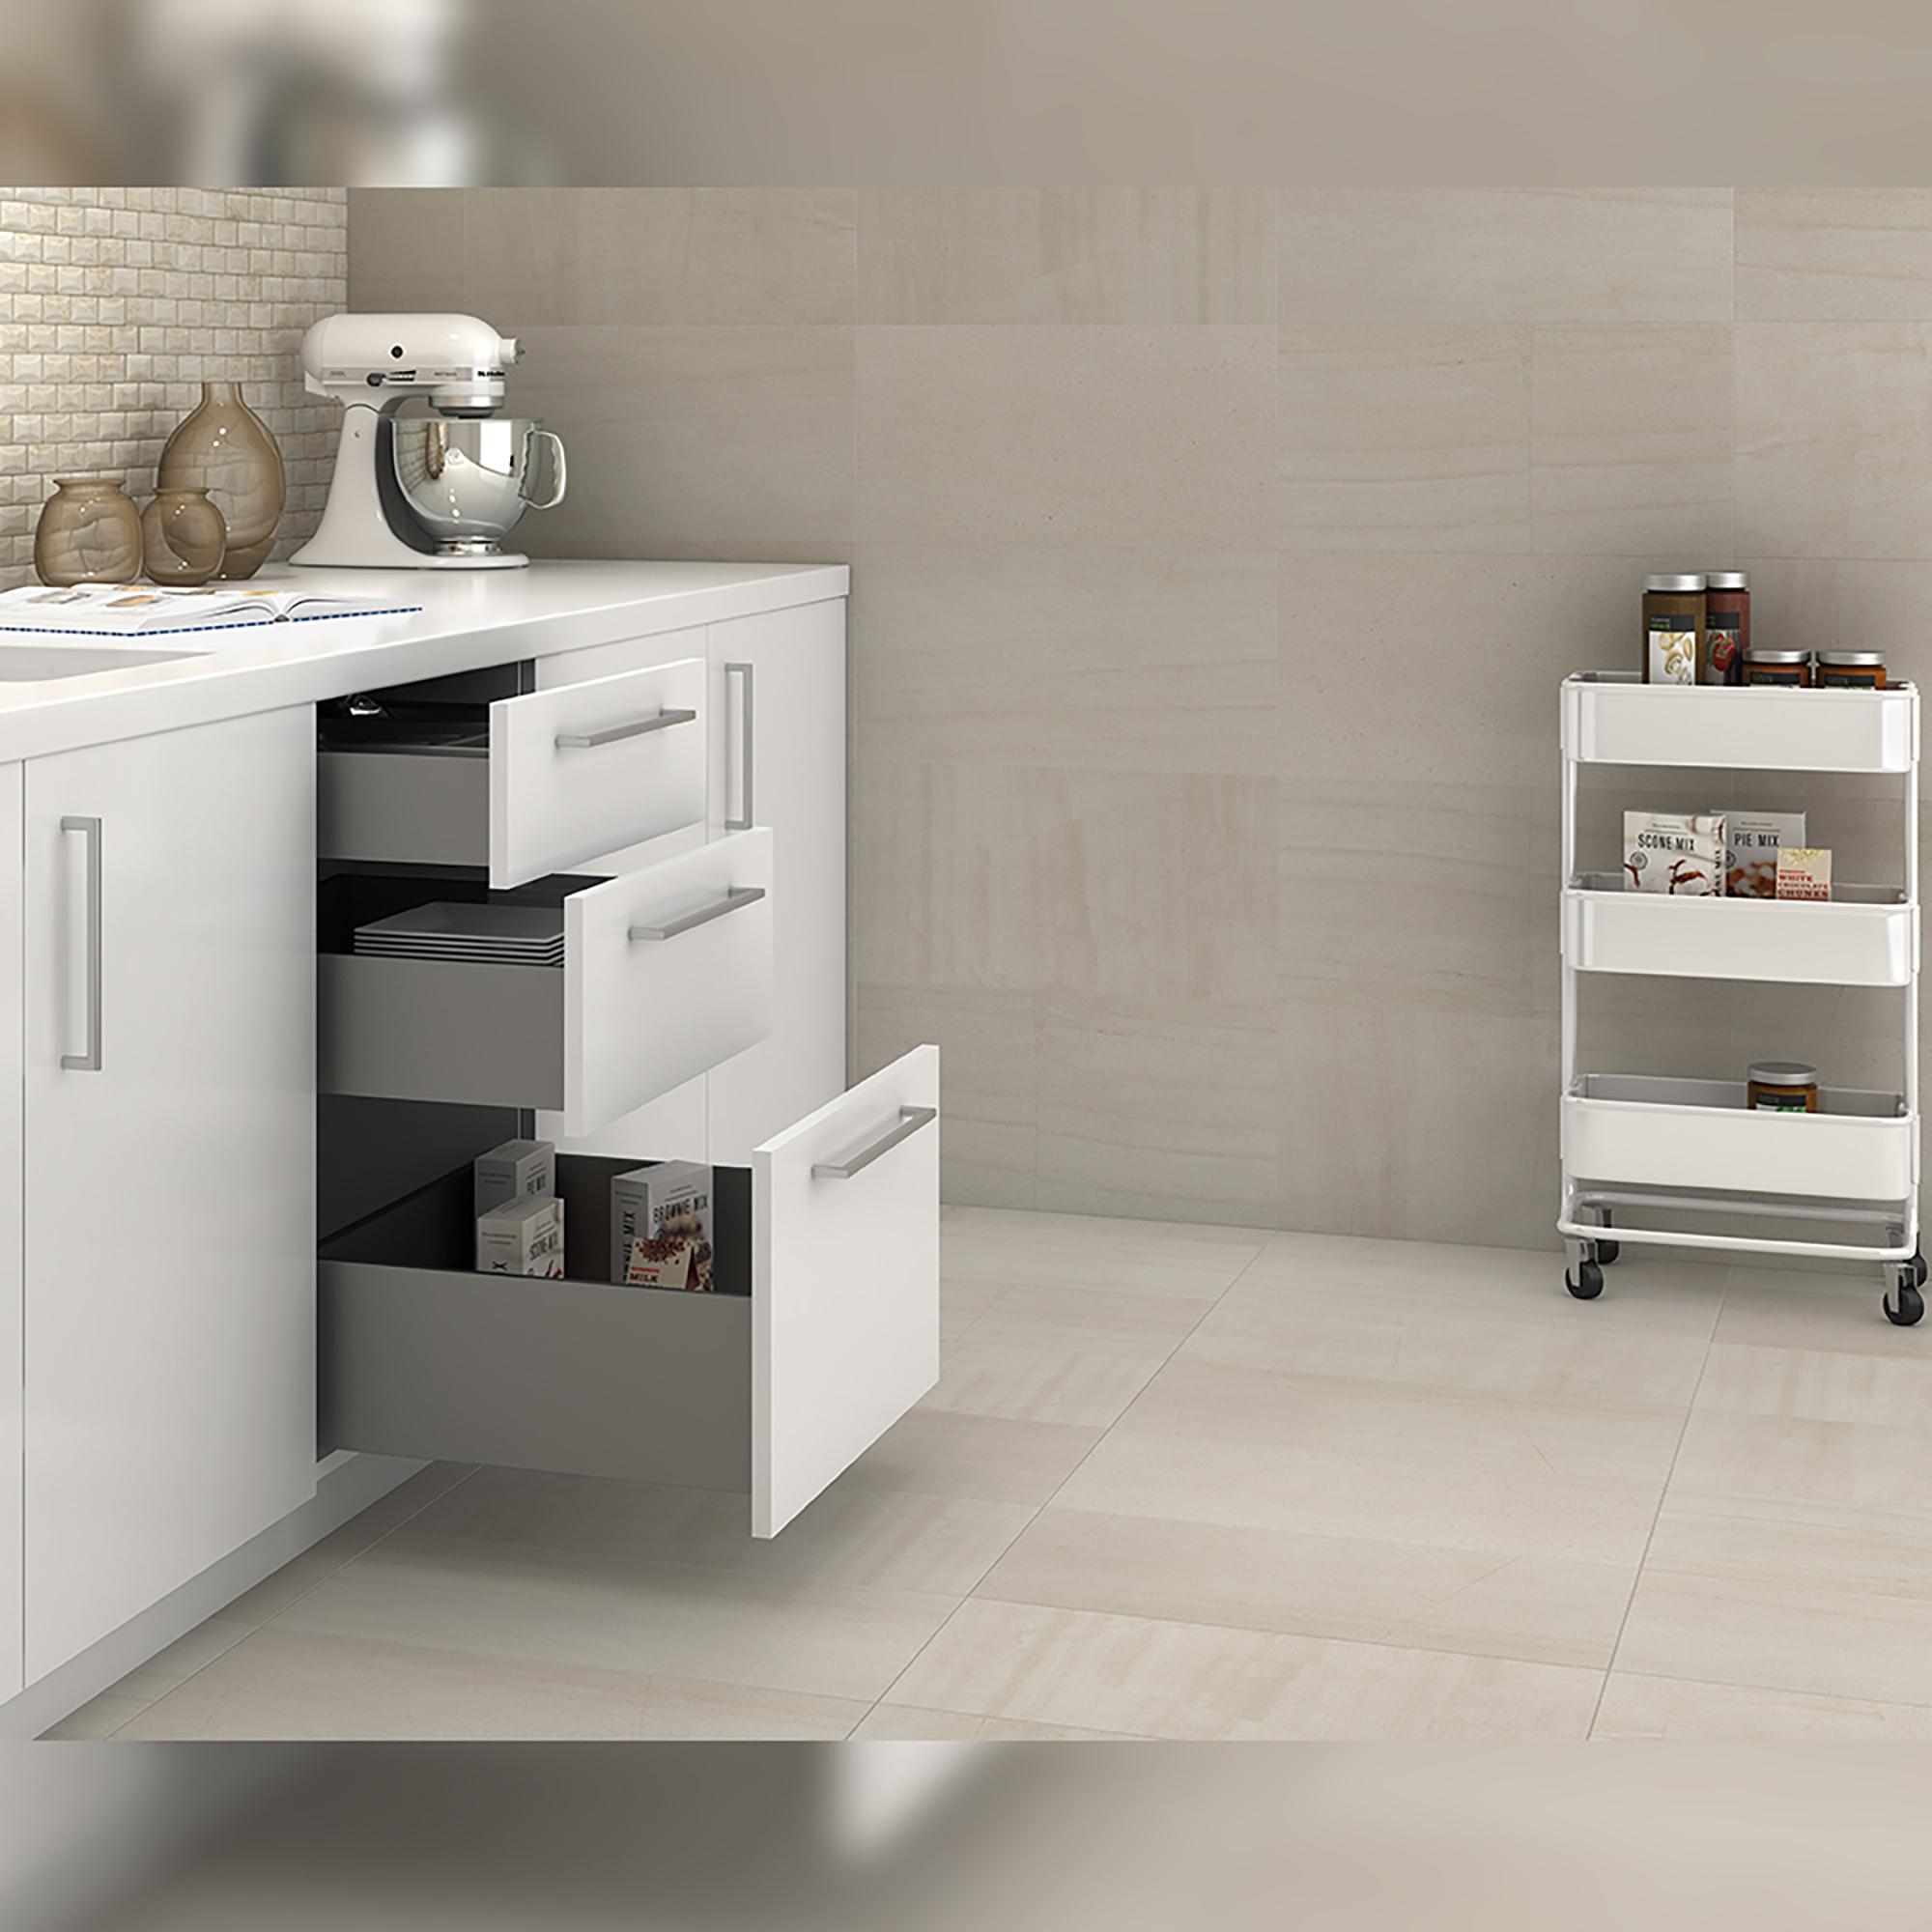 Emuca Kit cassetto per cucina Concept, altezza 105 mm, prof. 350 mm, chiusura soft, Acciaio, Grigio antracite